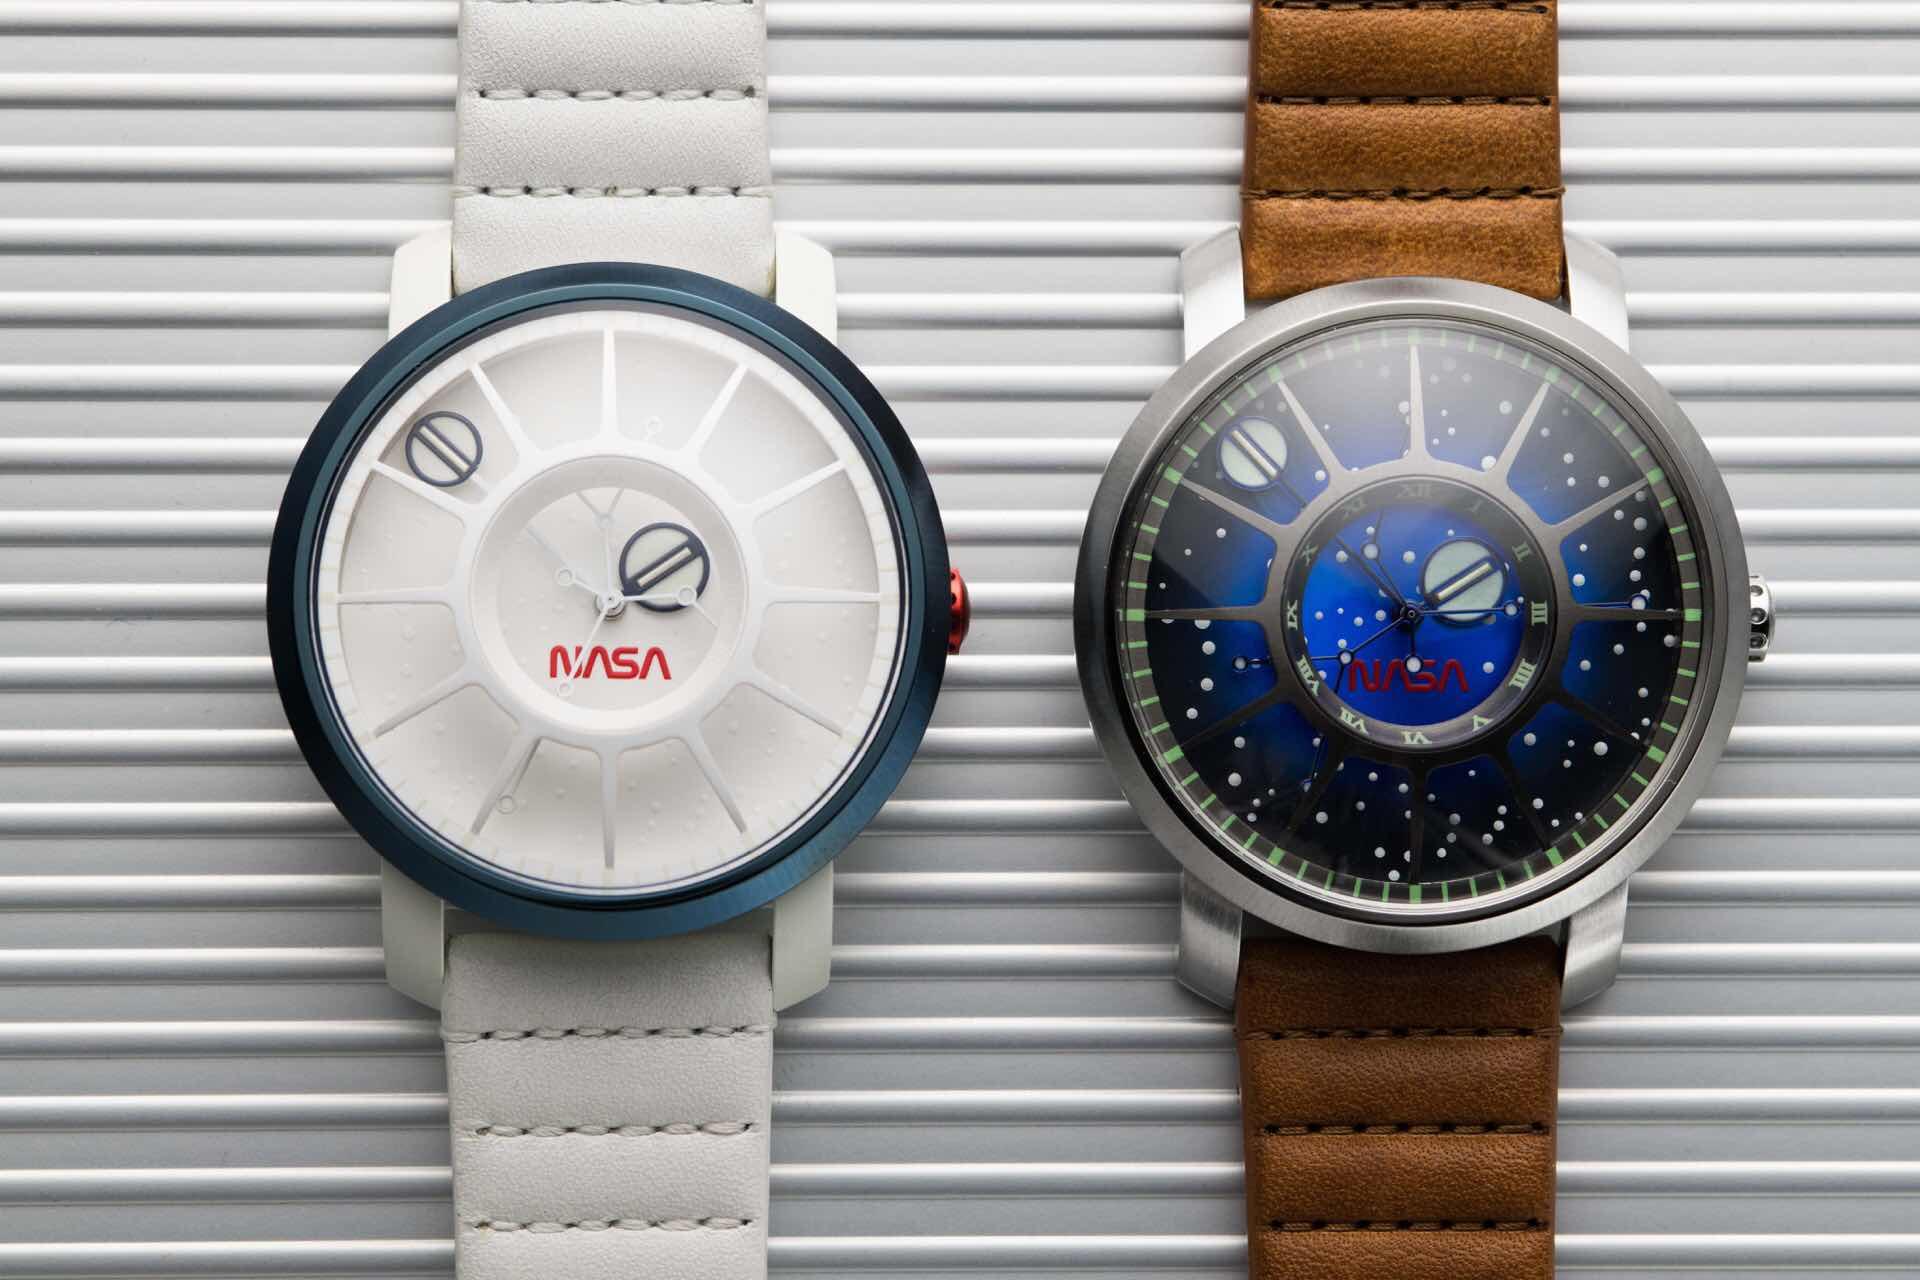 xeric-trappist-1-nasa-edition-automatic-watches-kickstarter